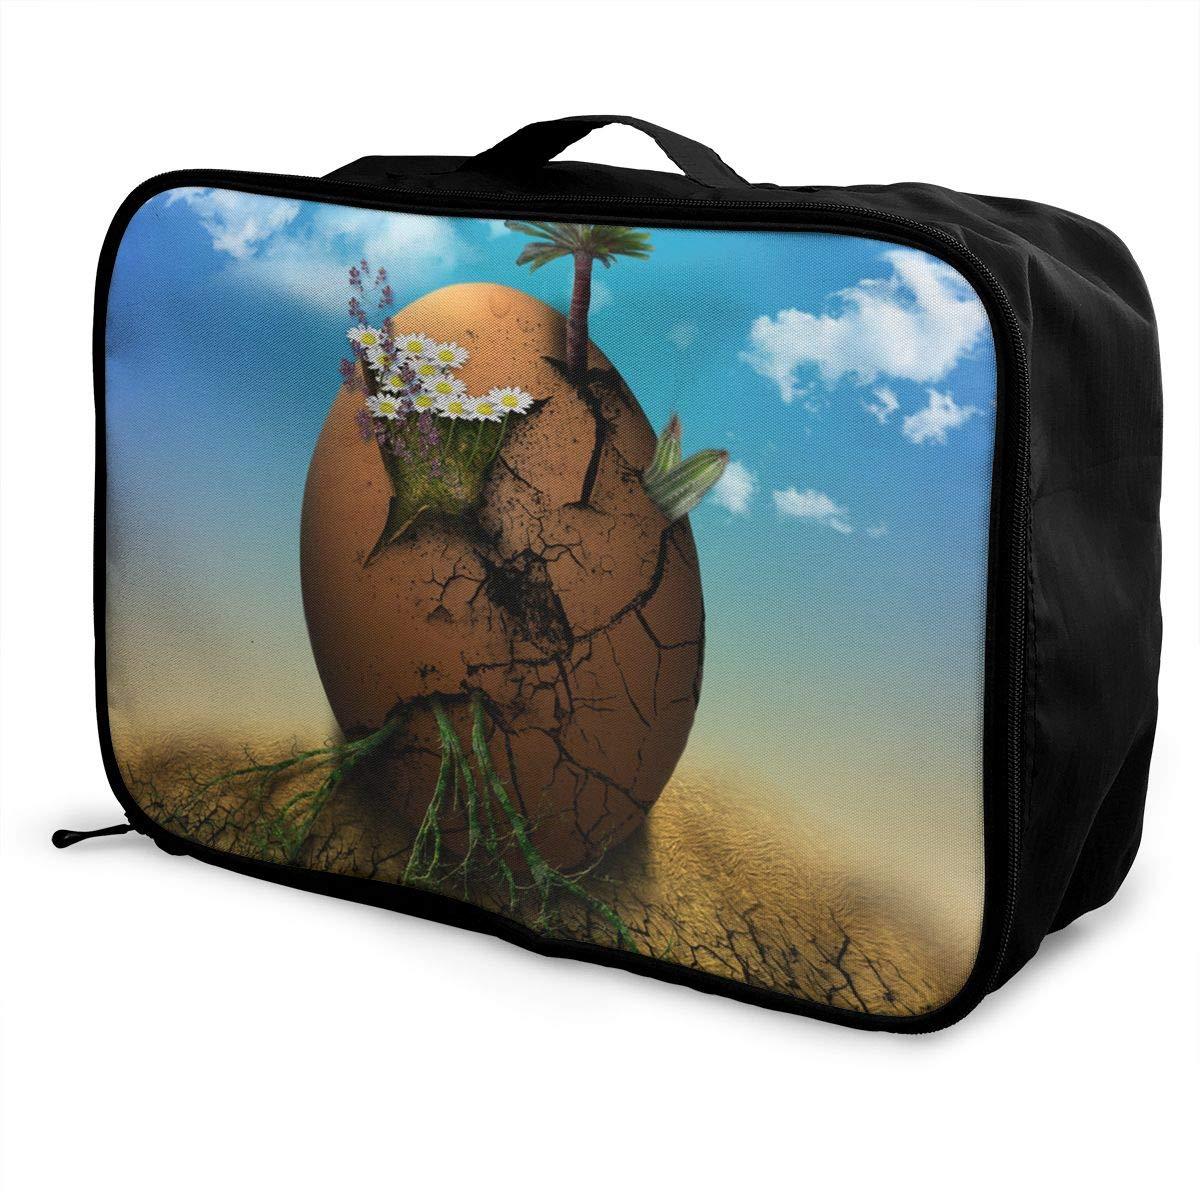 Travel Luggage Duffle Bag Lightweight Portable Handbag Egg World Large Capacity Waterproof Foldable Storage Tote